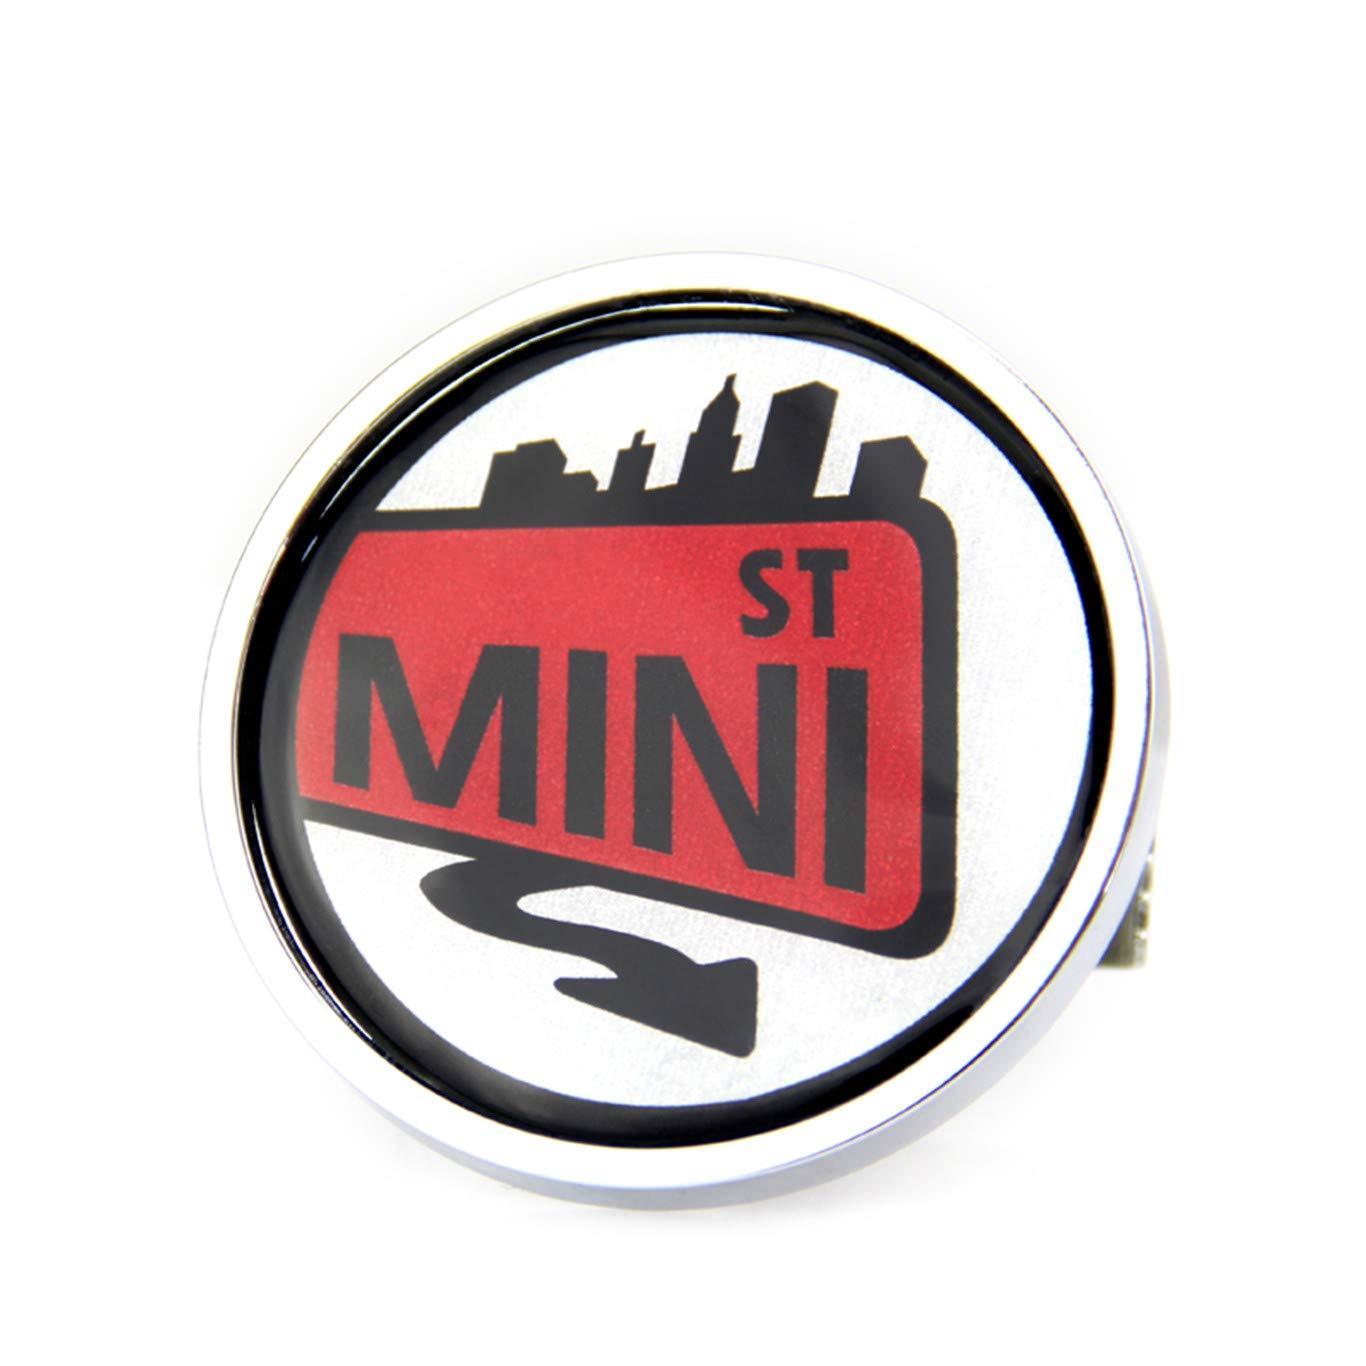 Emblema Adhesivo de Metal para Mini Cooper F54 F55 F56 F57 F60 R55 R56 R57 R58 R59 R60 R61 Hardtop Clubman Hatchback Covertible Roadster Countryman Paceman HDX Parrilla para cap/ó Delantero